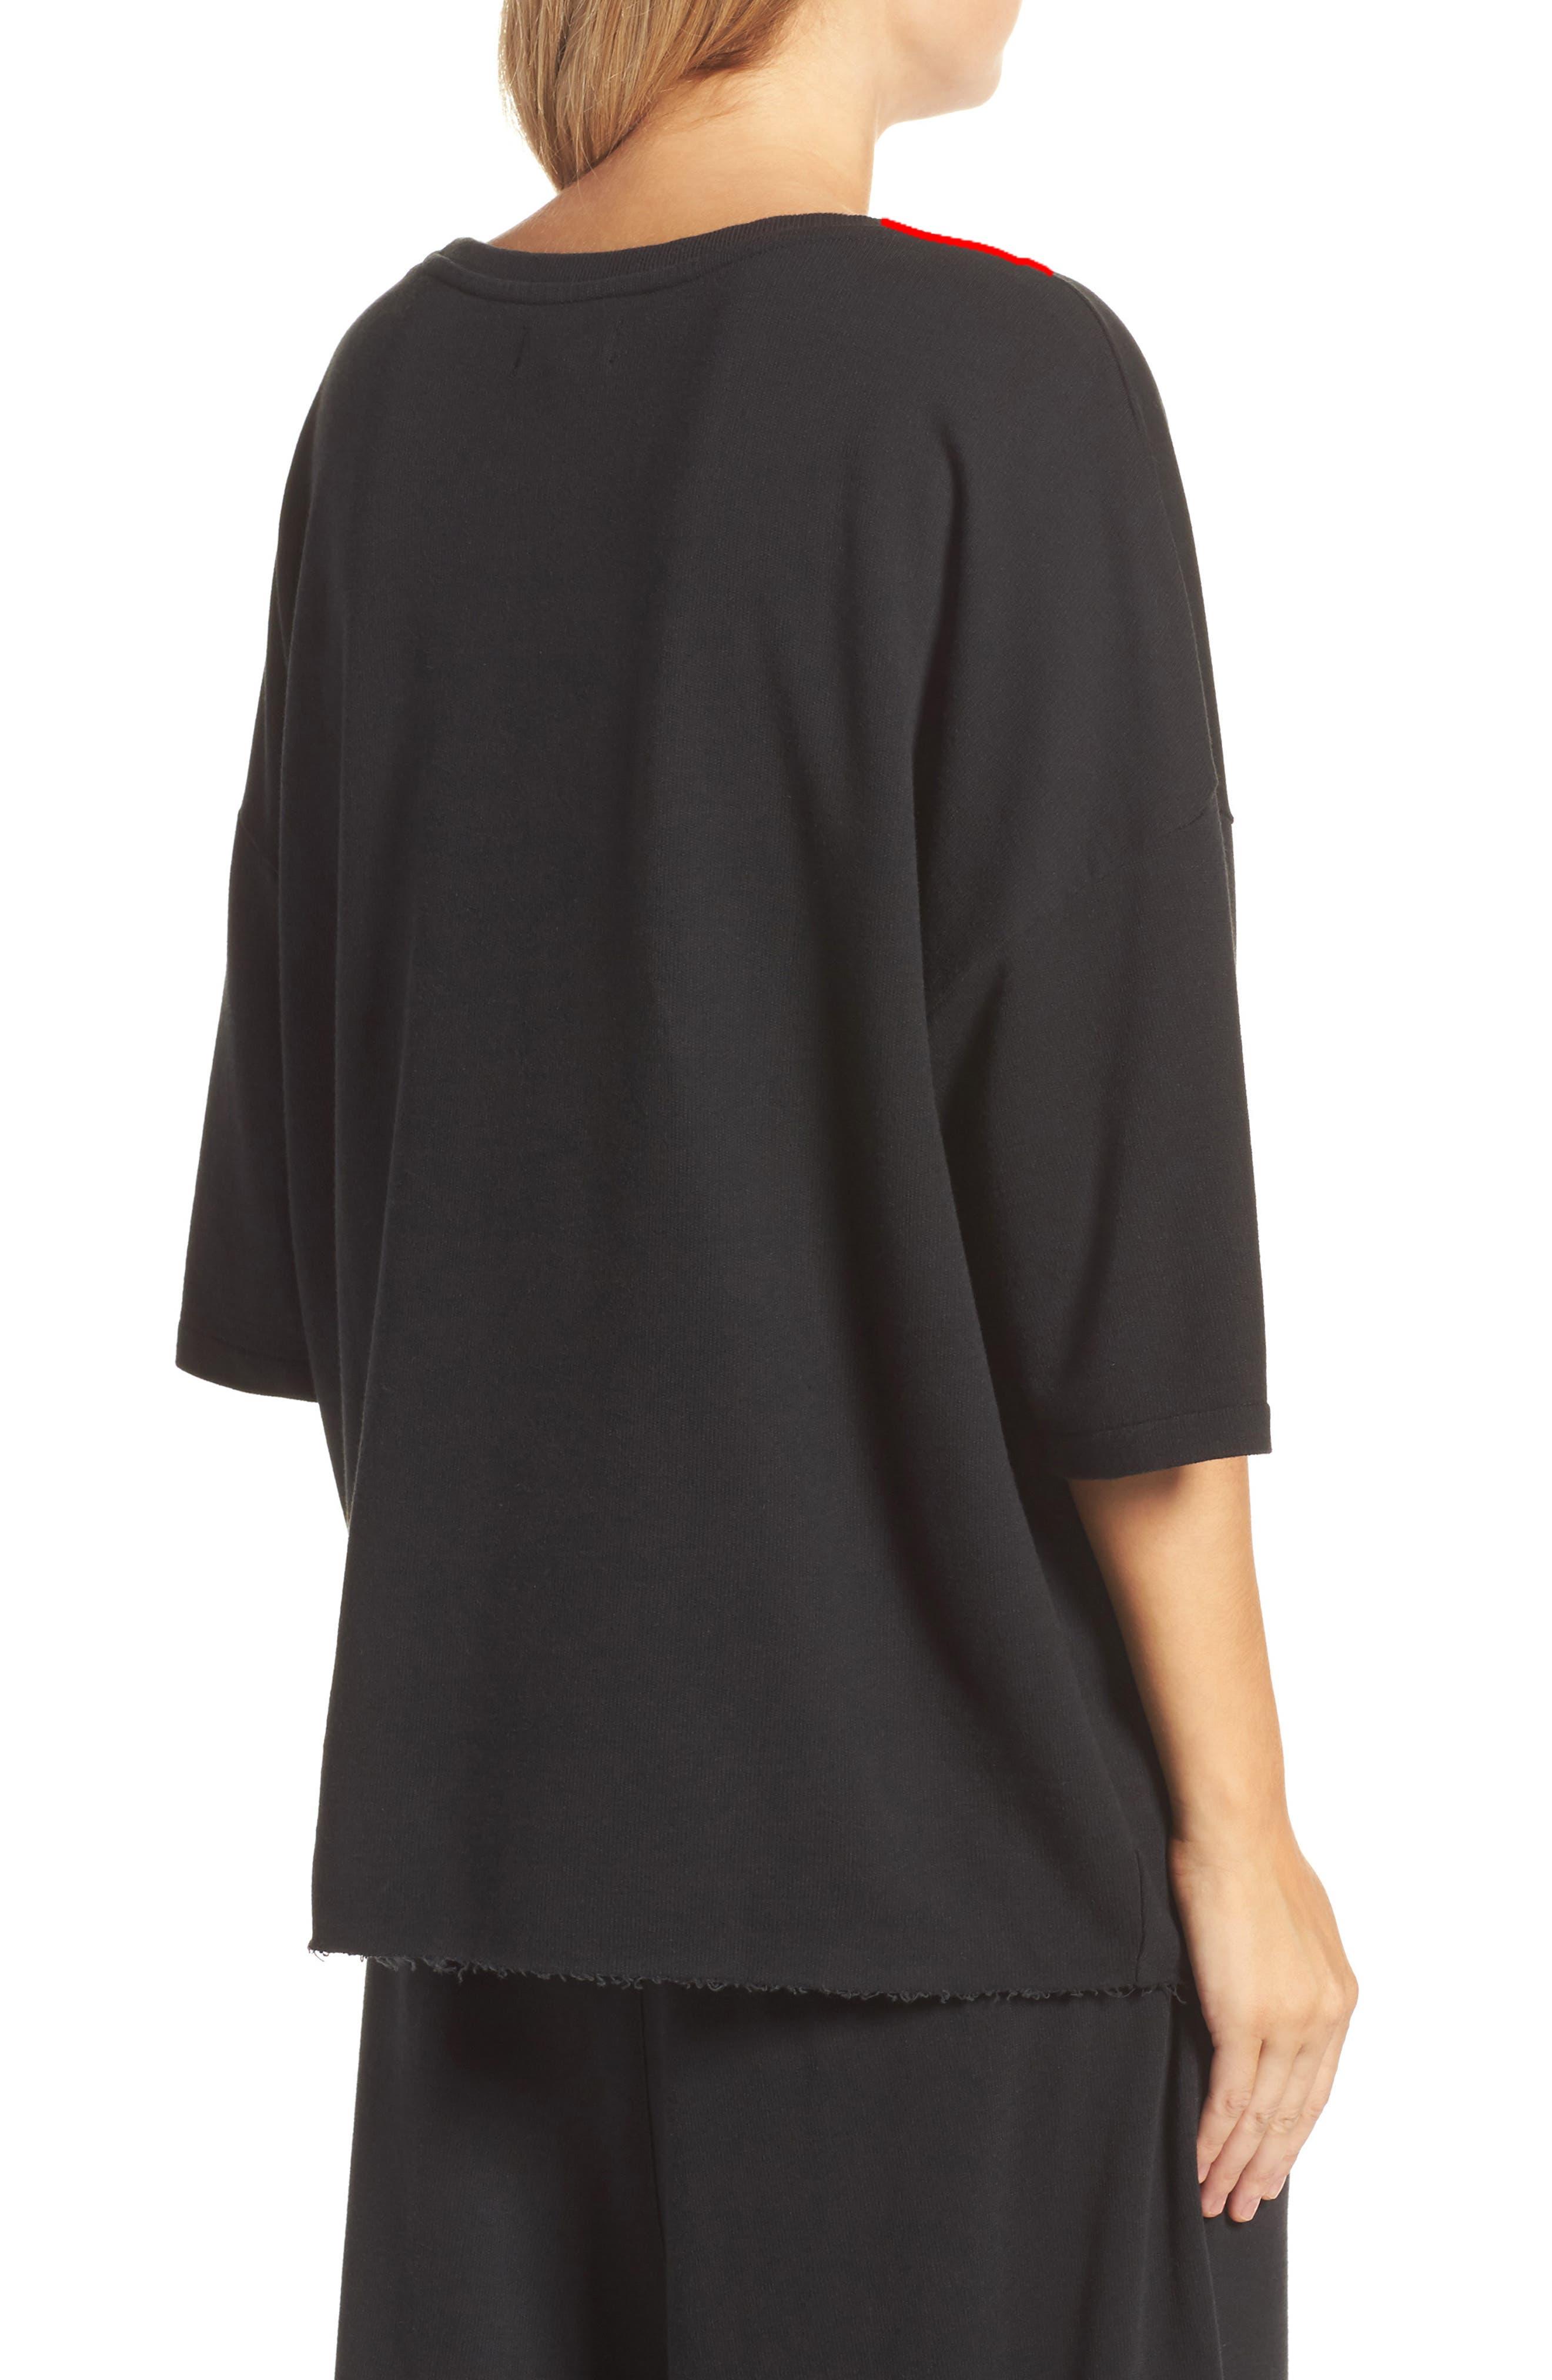 Soph Lounge Sweater,                             Alternate thumbnail 2, color,                             Plain Black Marle